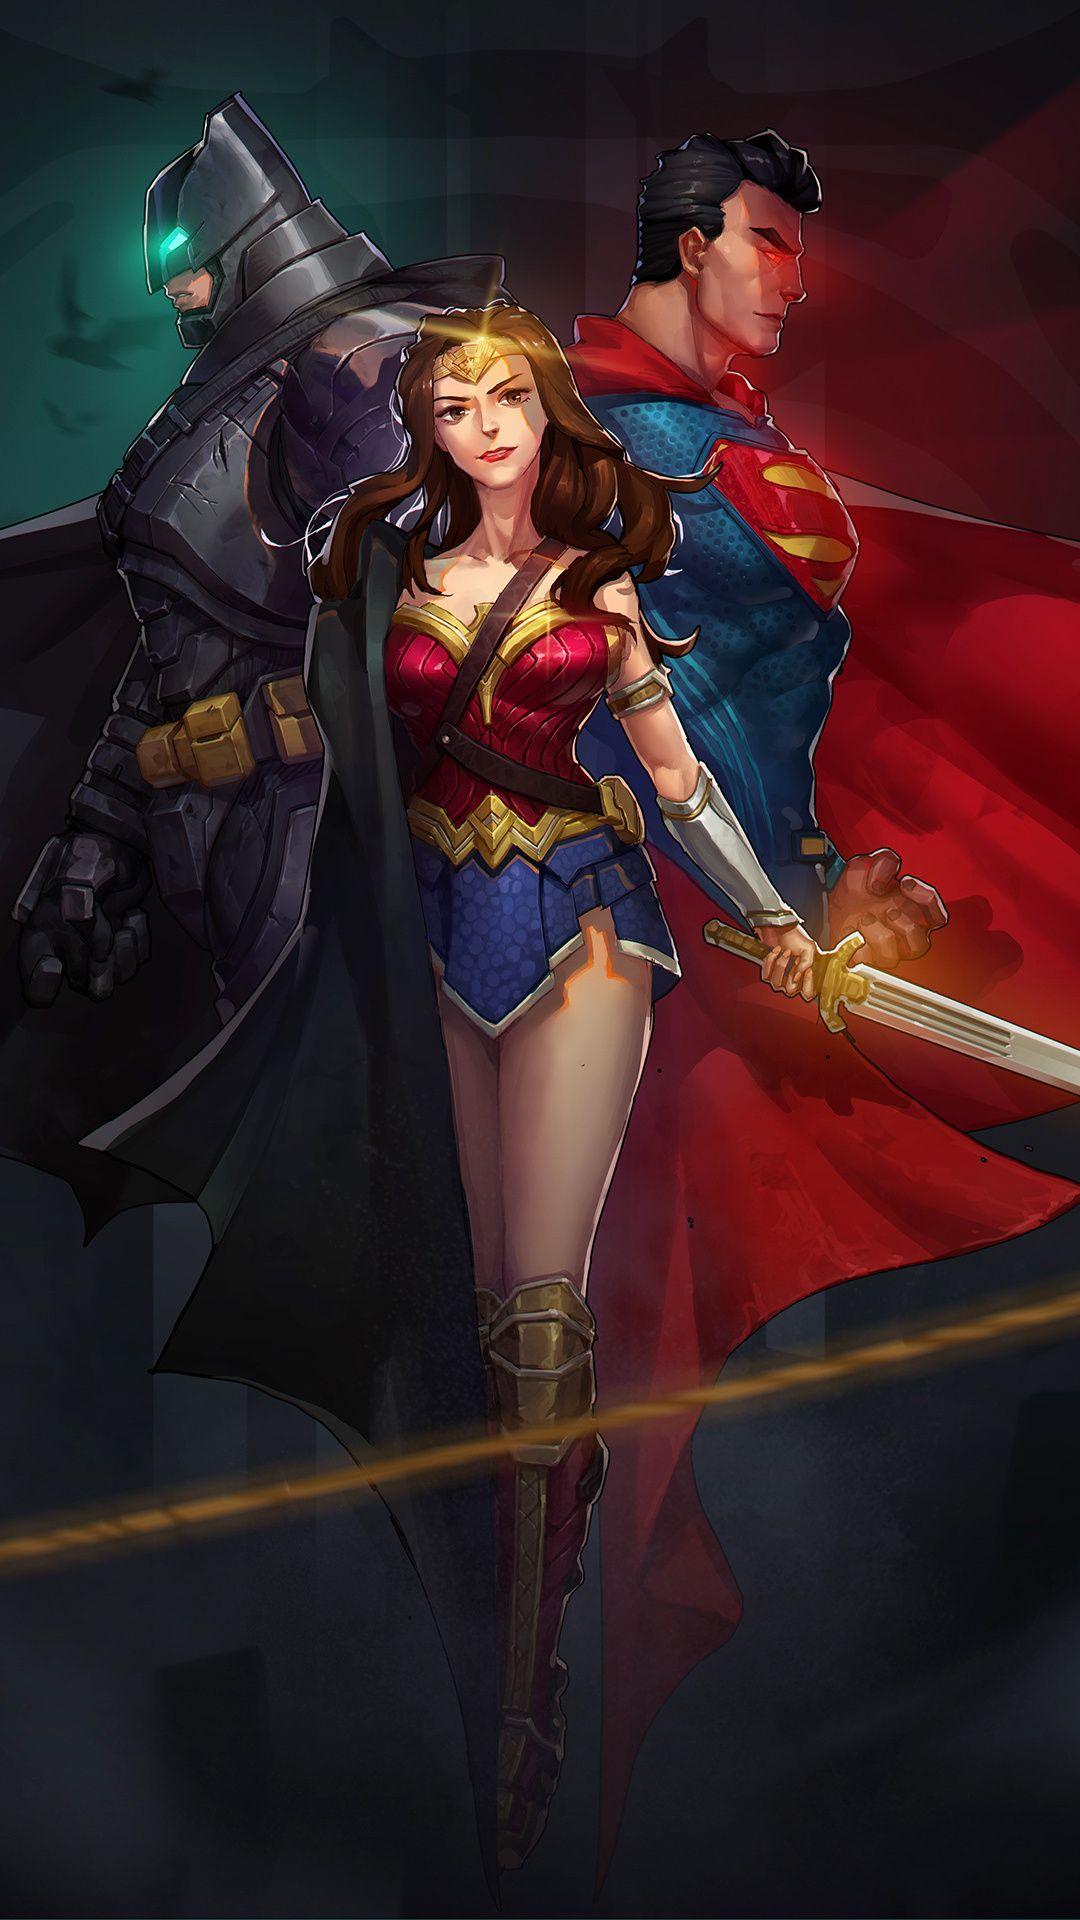 1080x1920 Fanart Justice League Guardian Superheroes Wonder Woman Batman Superman Wallpap Batman Superman Wonder Woman Superman Wonder Woman Wonder Woman